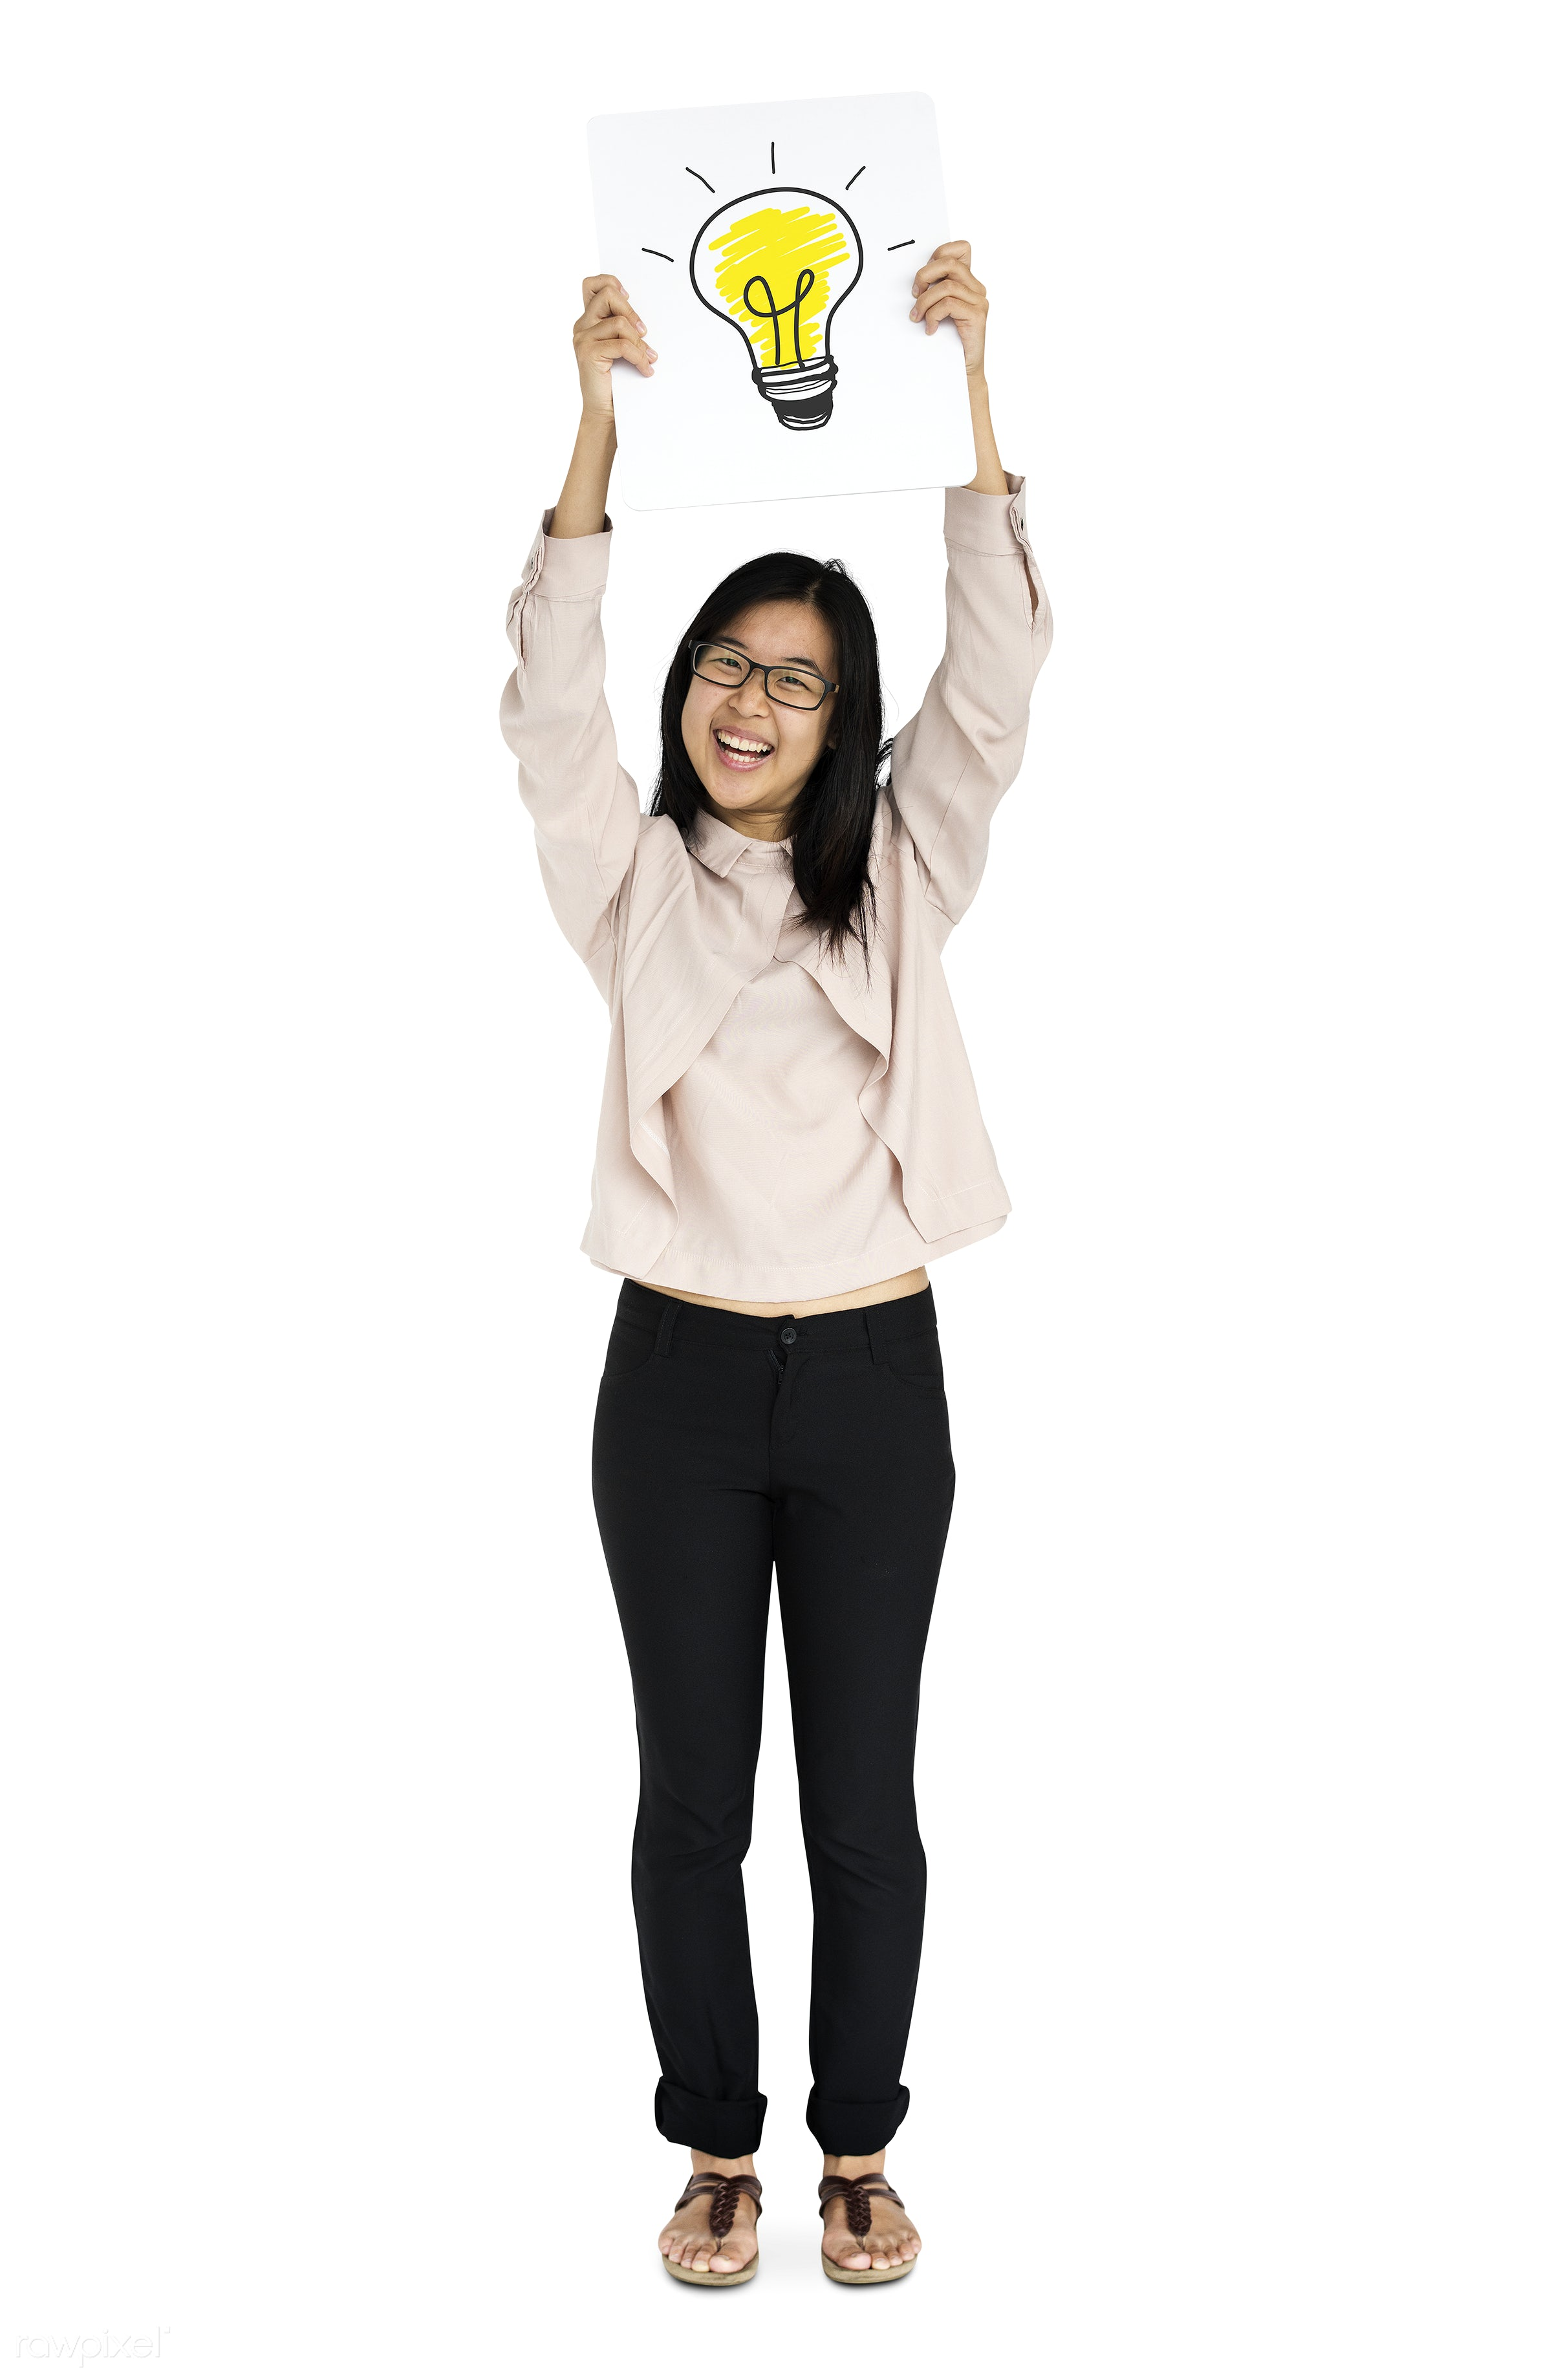 idea, woman, asian, background, casual, cheerful, copy space, ethnic, ethnicity, eyeglasses, female, femininity, happiness,...